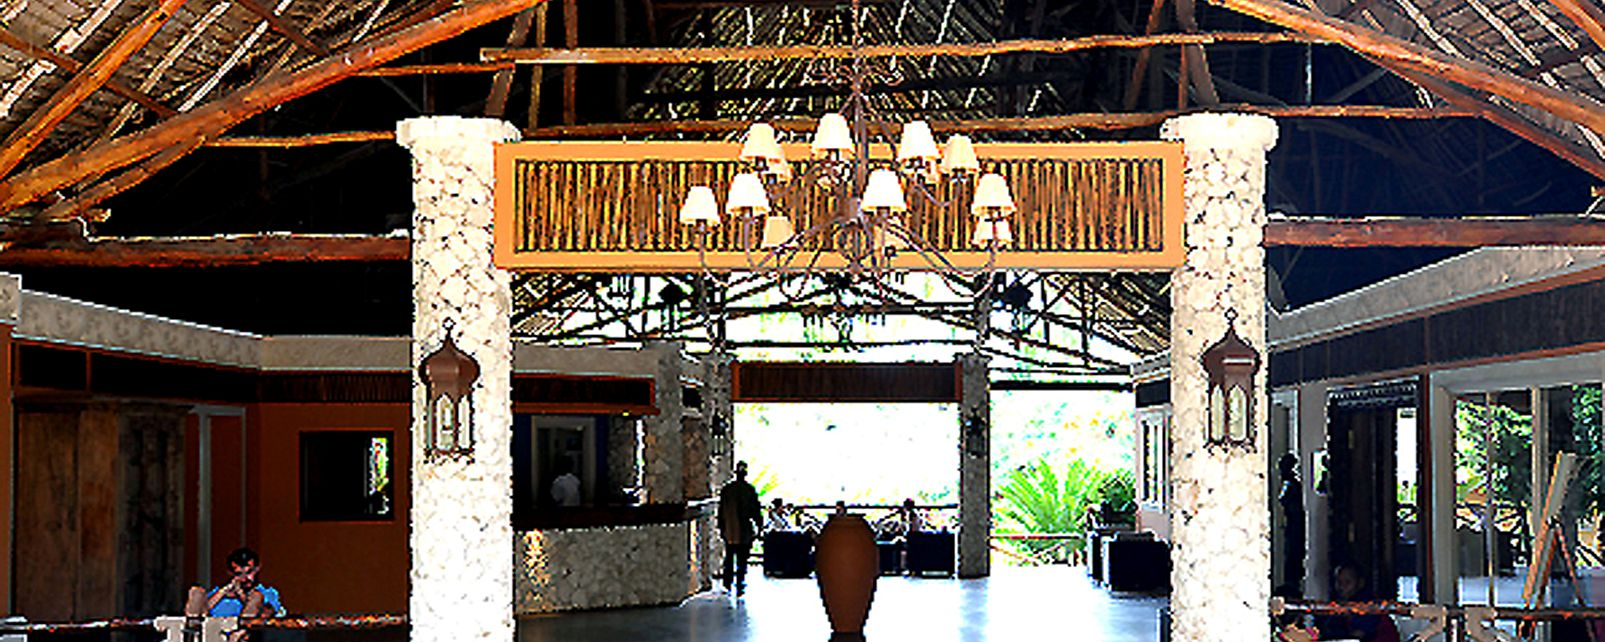 Hôtel Fairmont Zanzibar